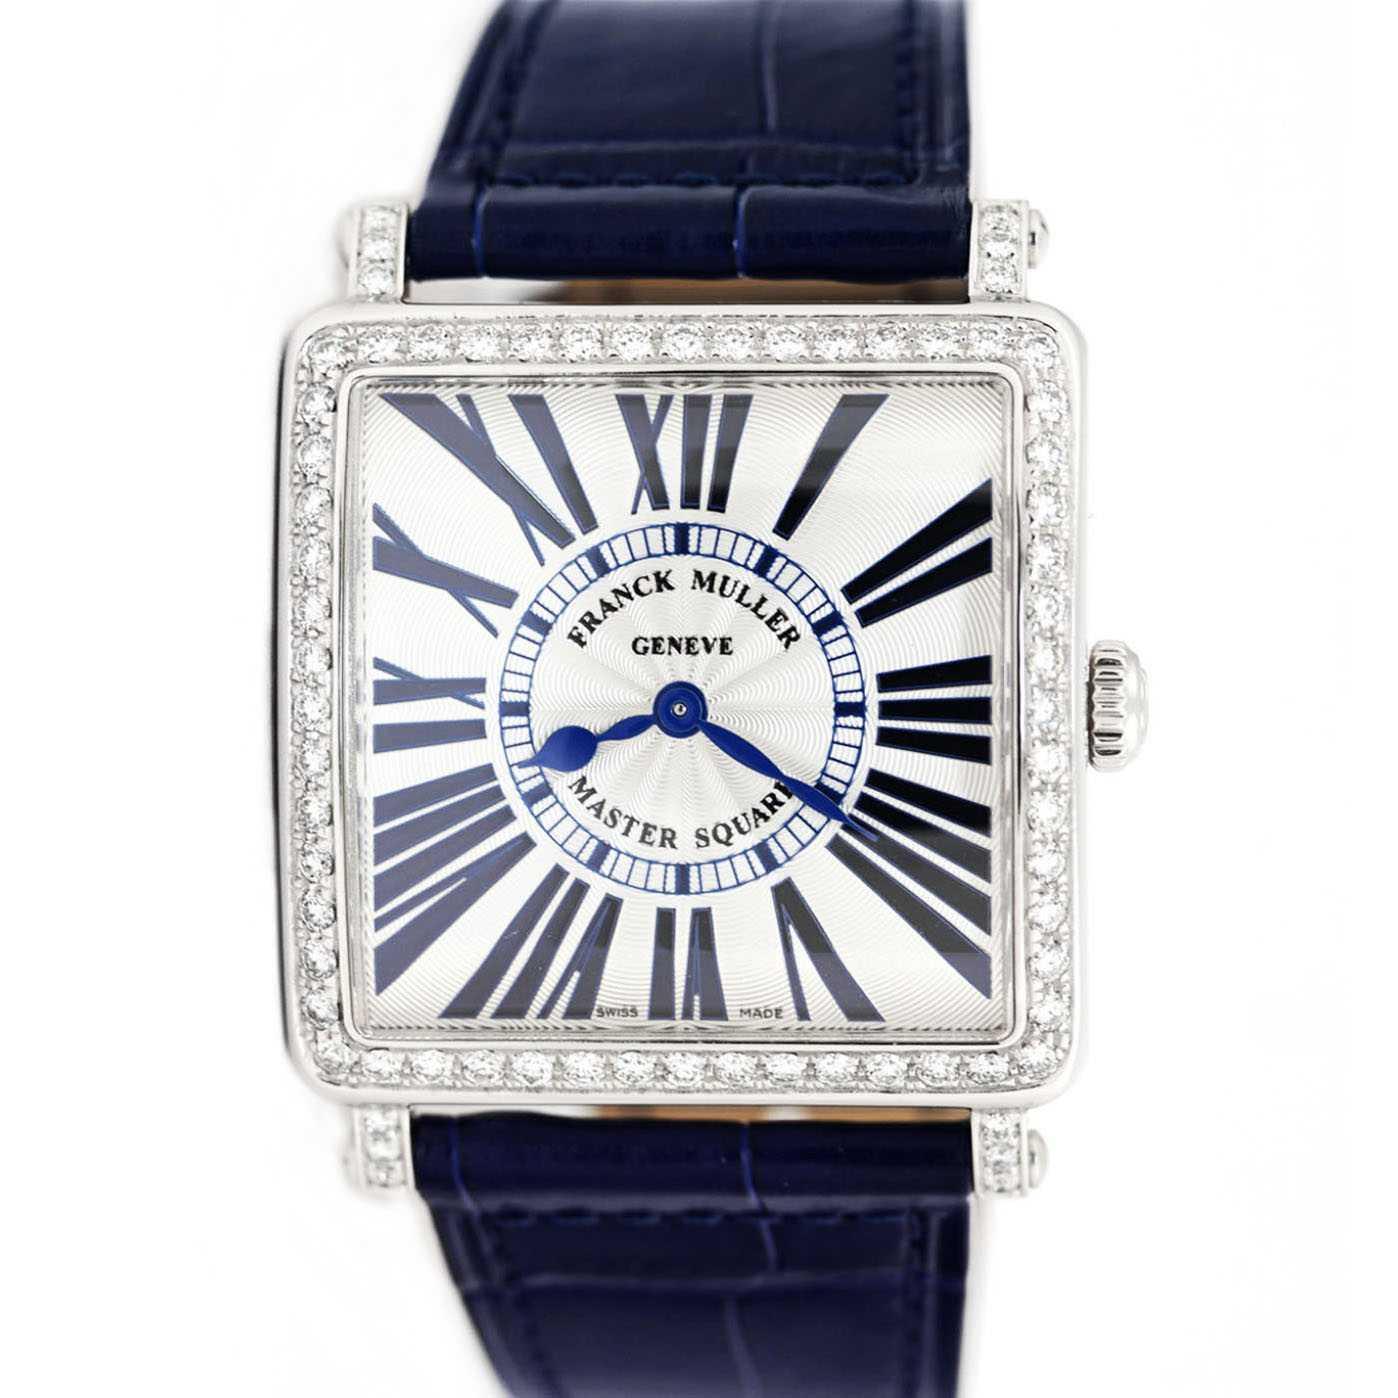 Franck Muller Master Square Blue Concept Quartz Diamond Watch